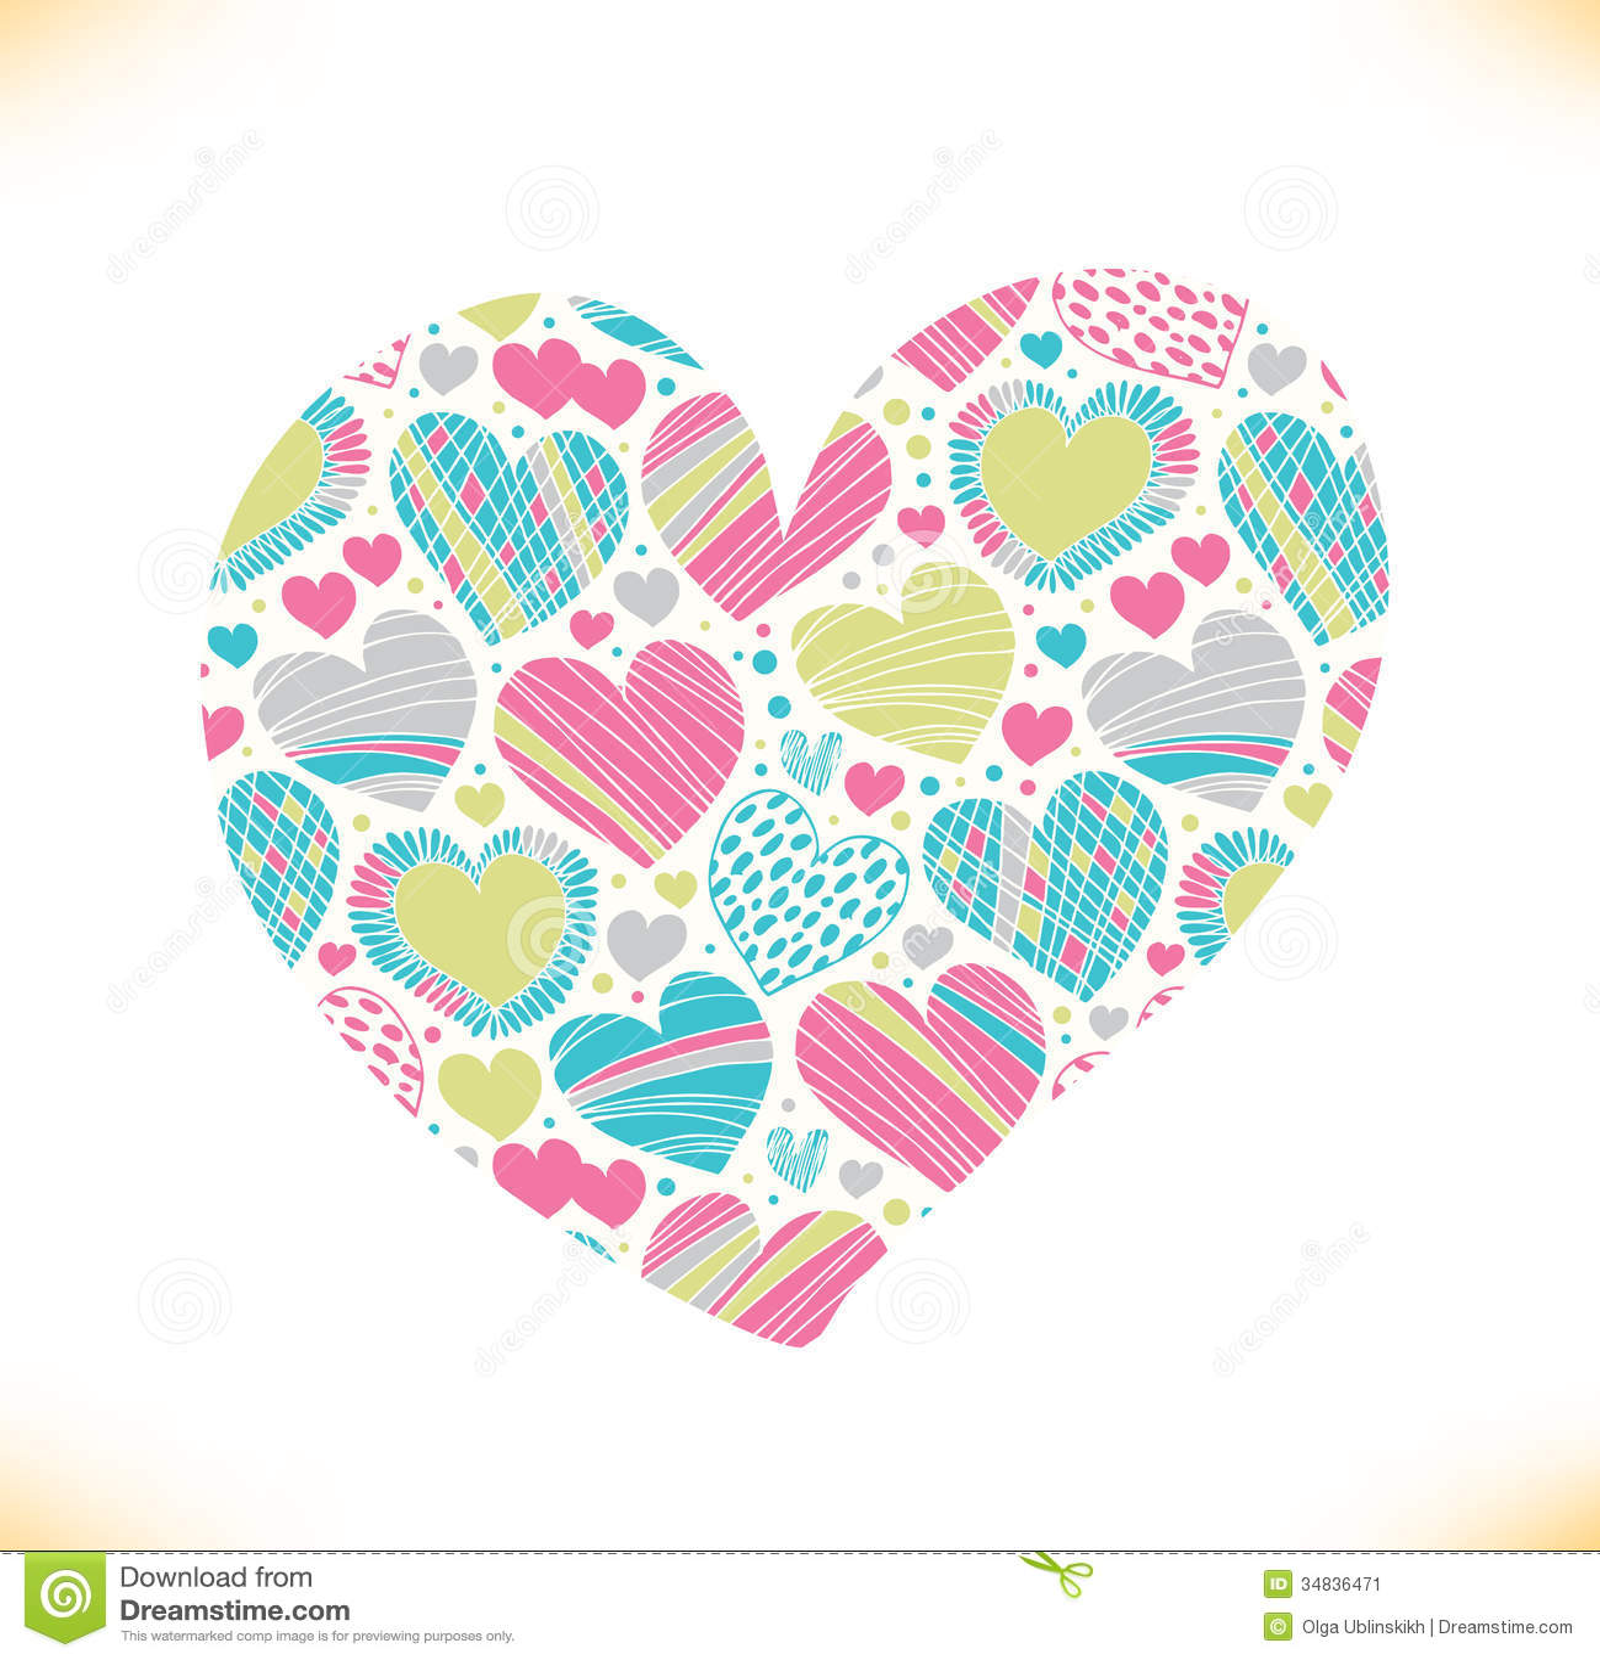 Colorful love ornamental pattern on heart beautiful love symbol colorful love ornamental pattern on heart beautiful love symbol buycottarizona Gallery